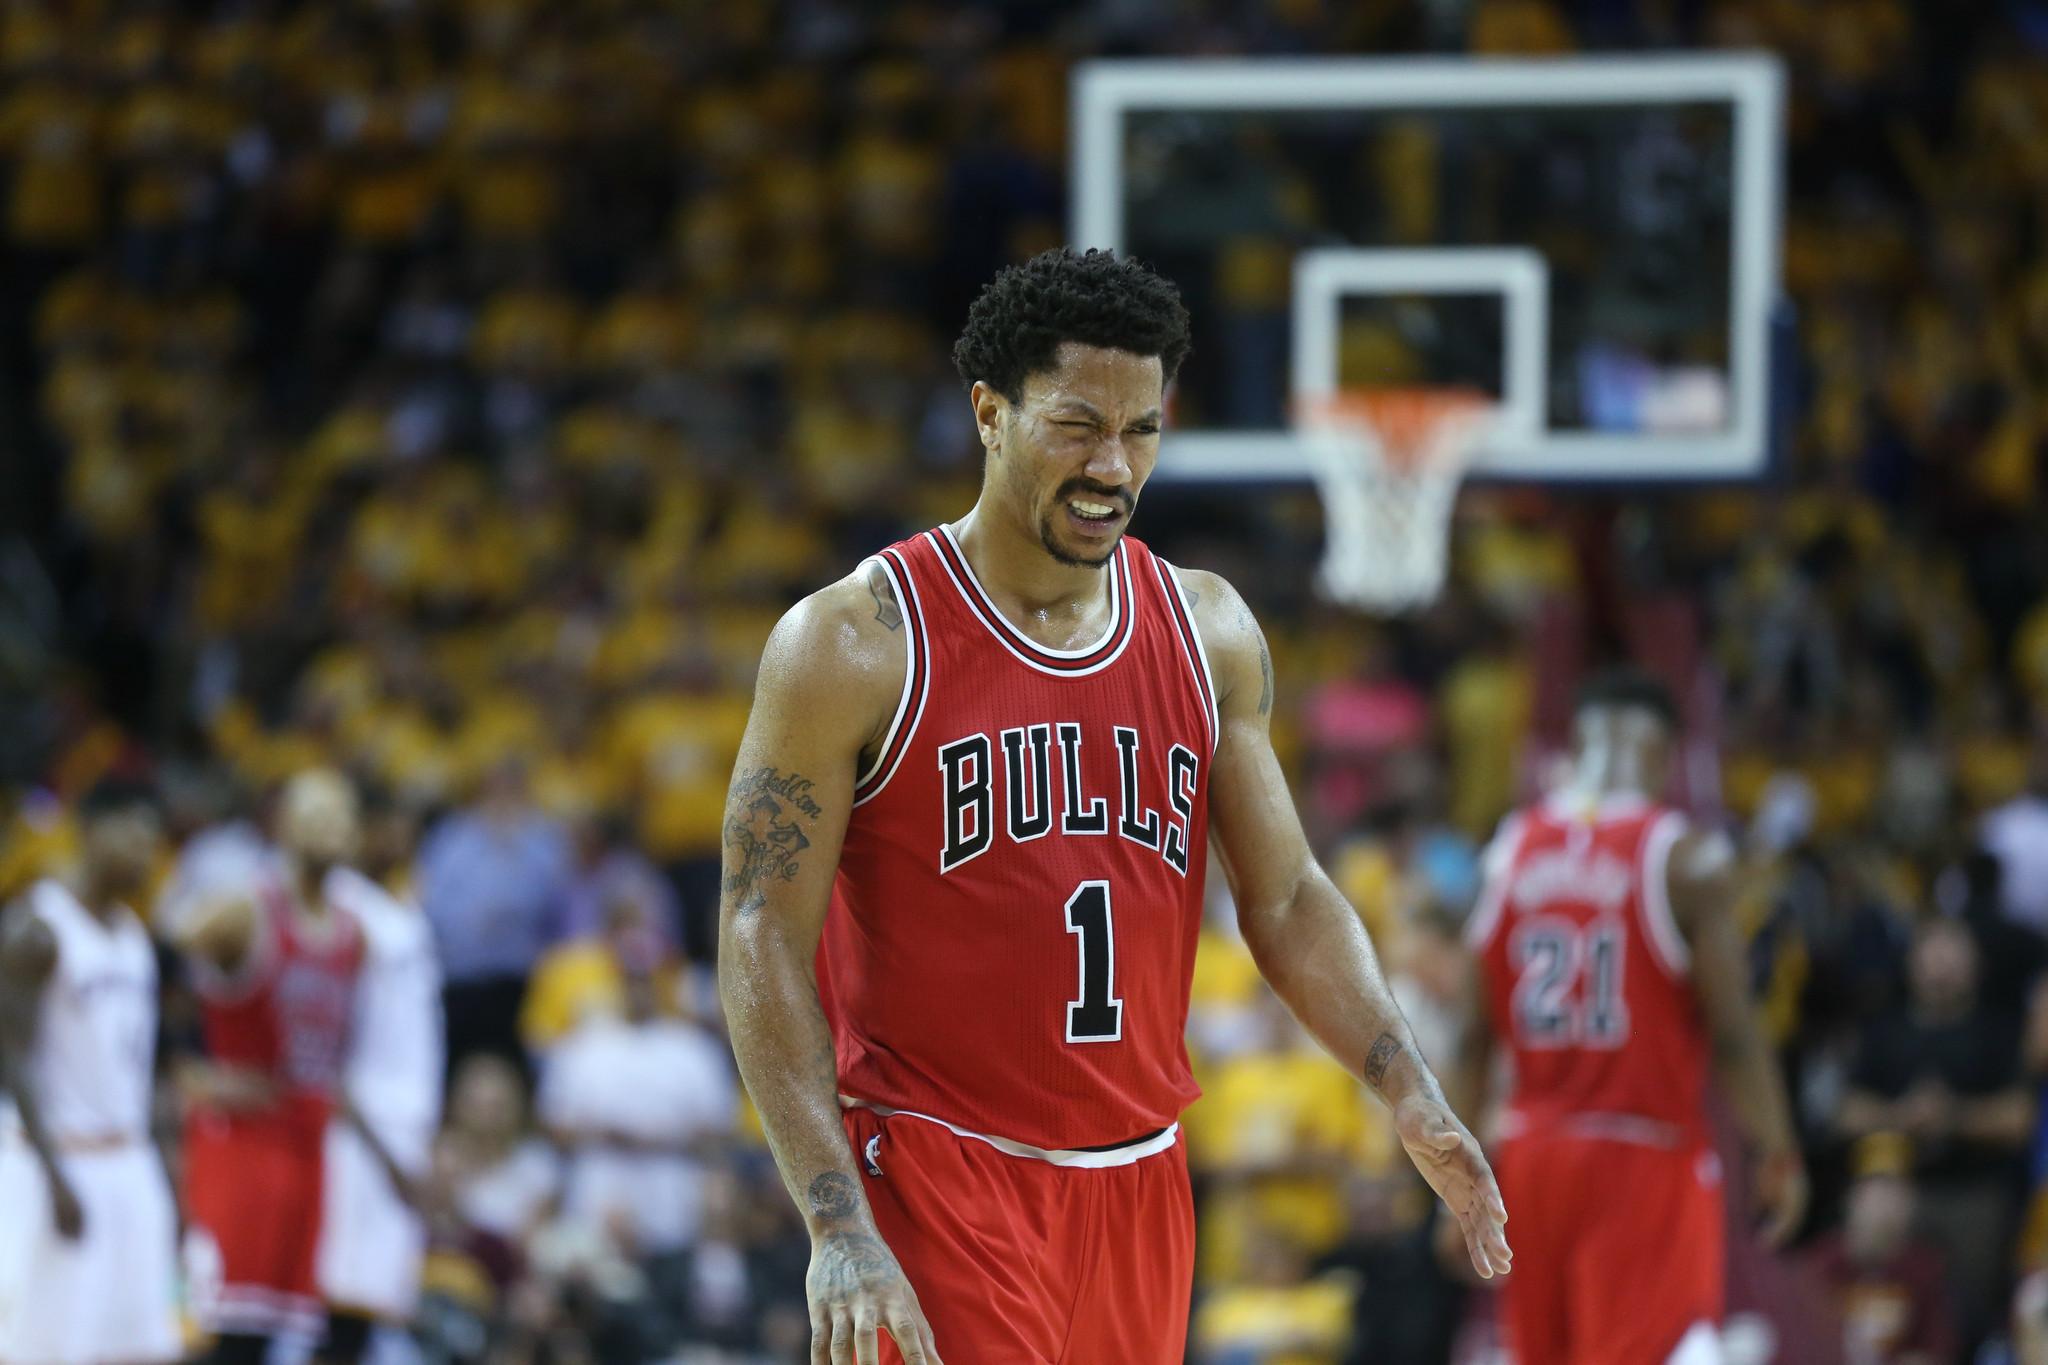 Bulls' Derrick Rose says shoulder is fine